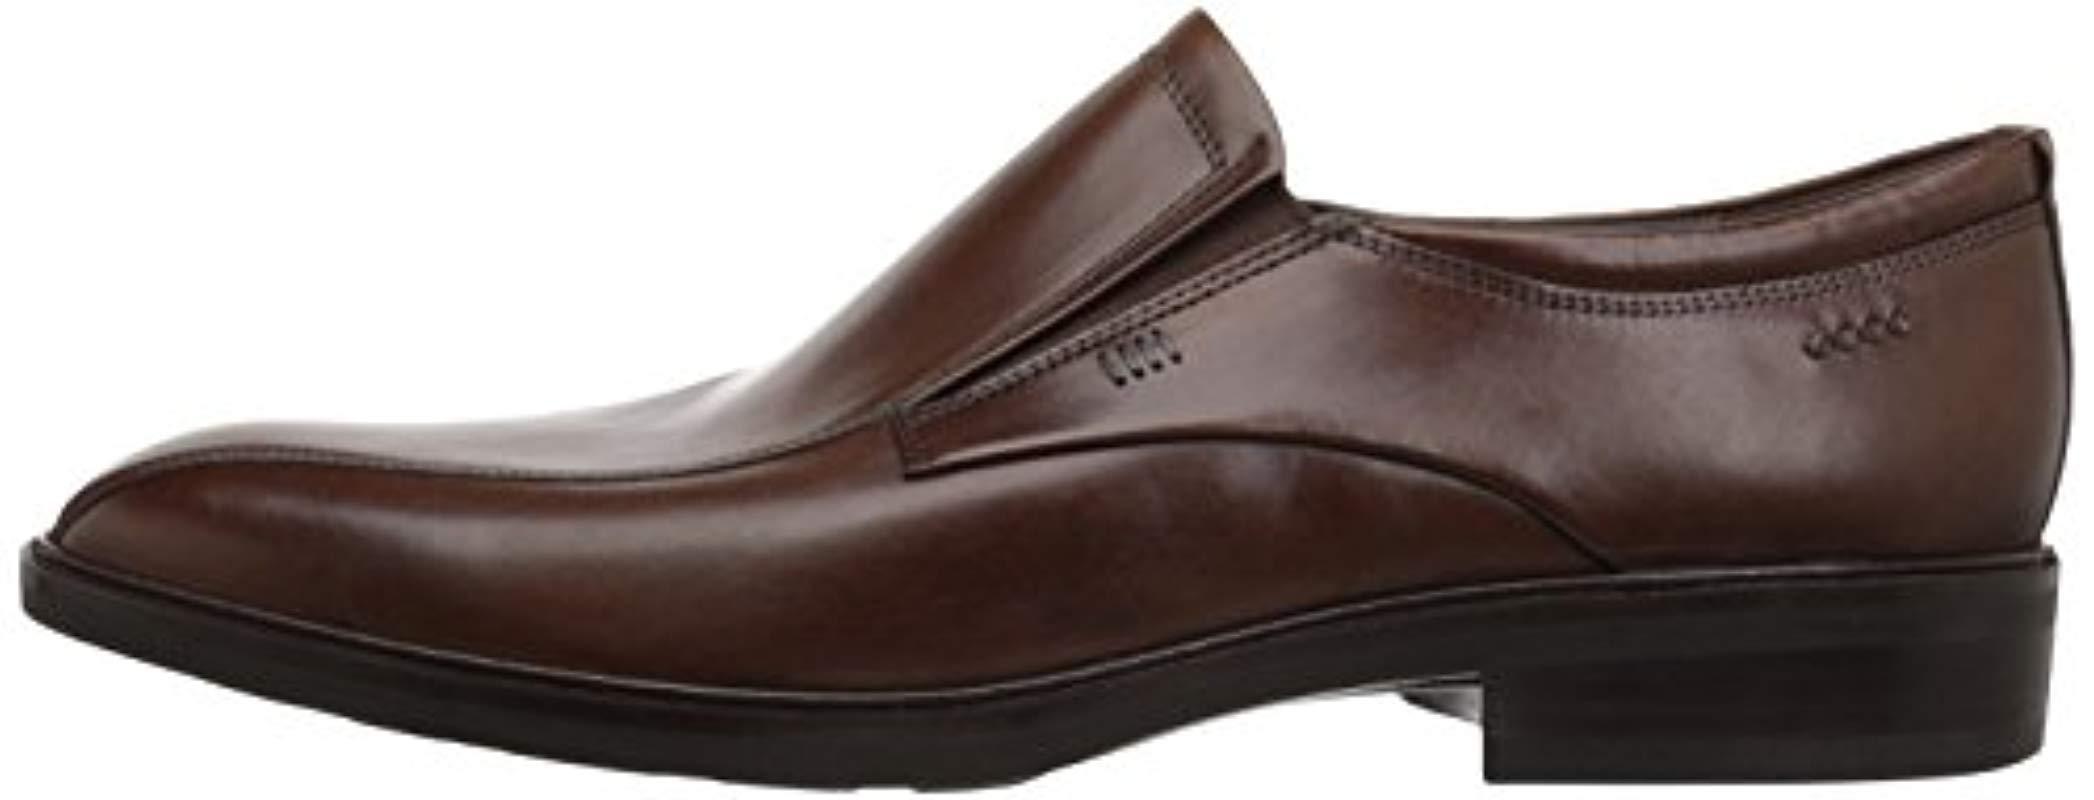 Ecco Leather Illinois Slip On in Walnut